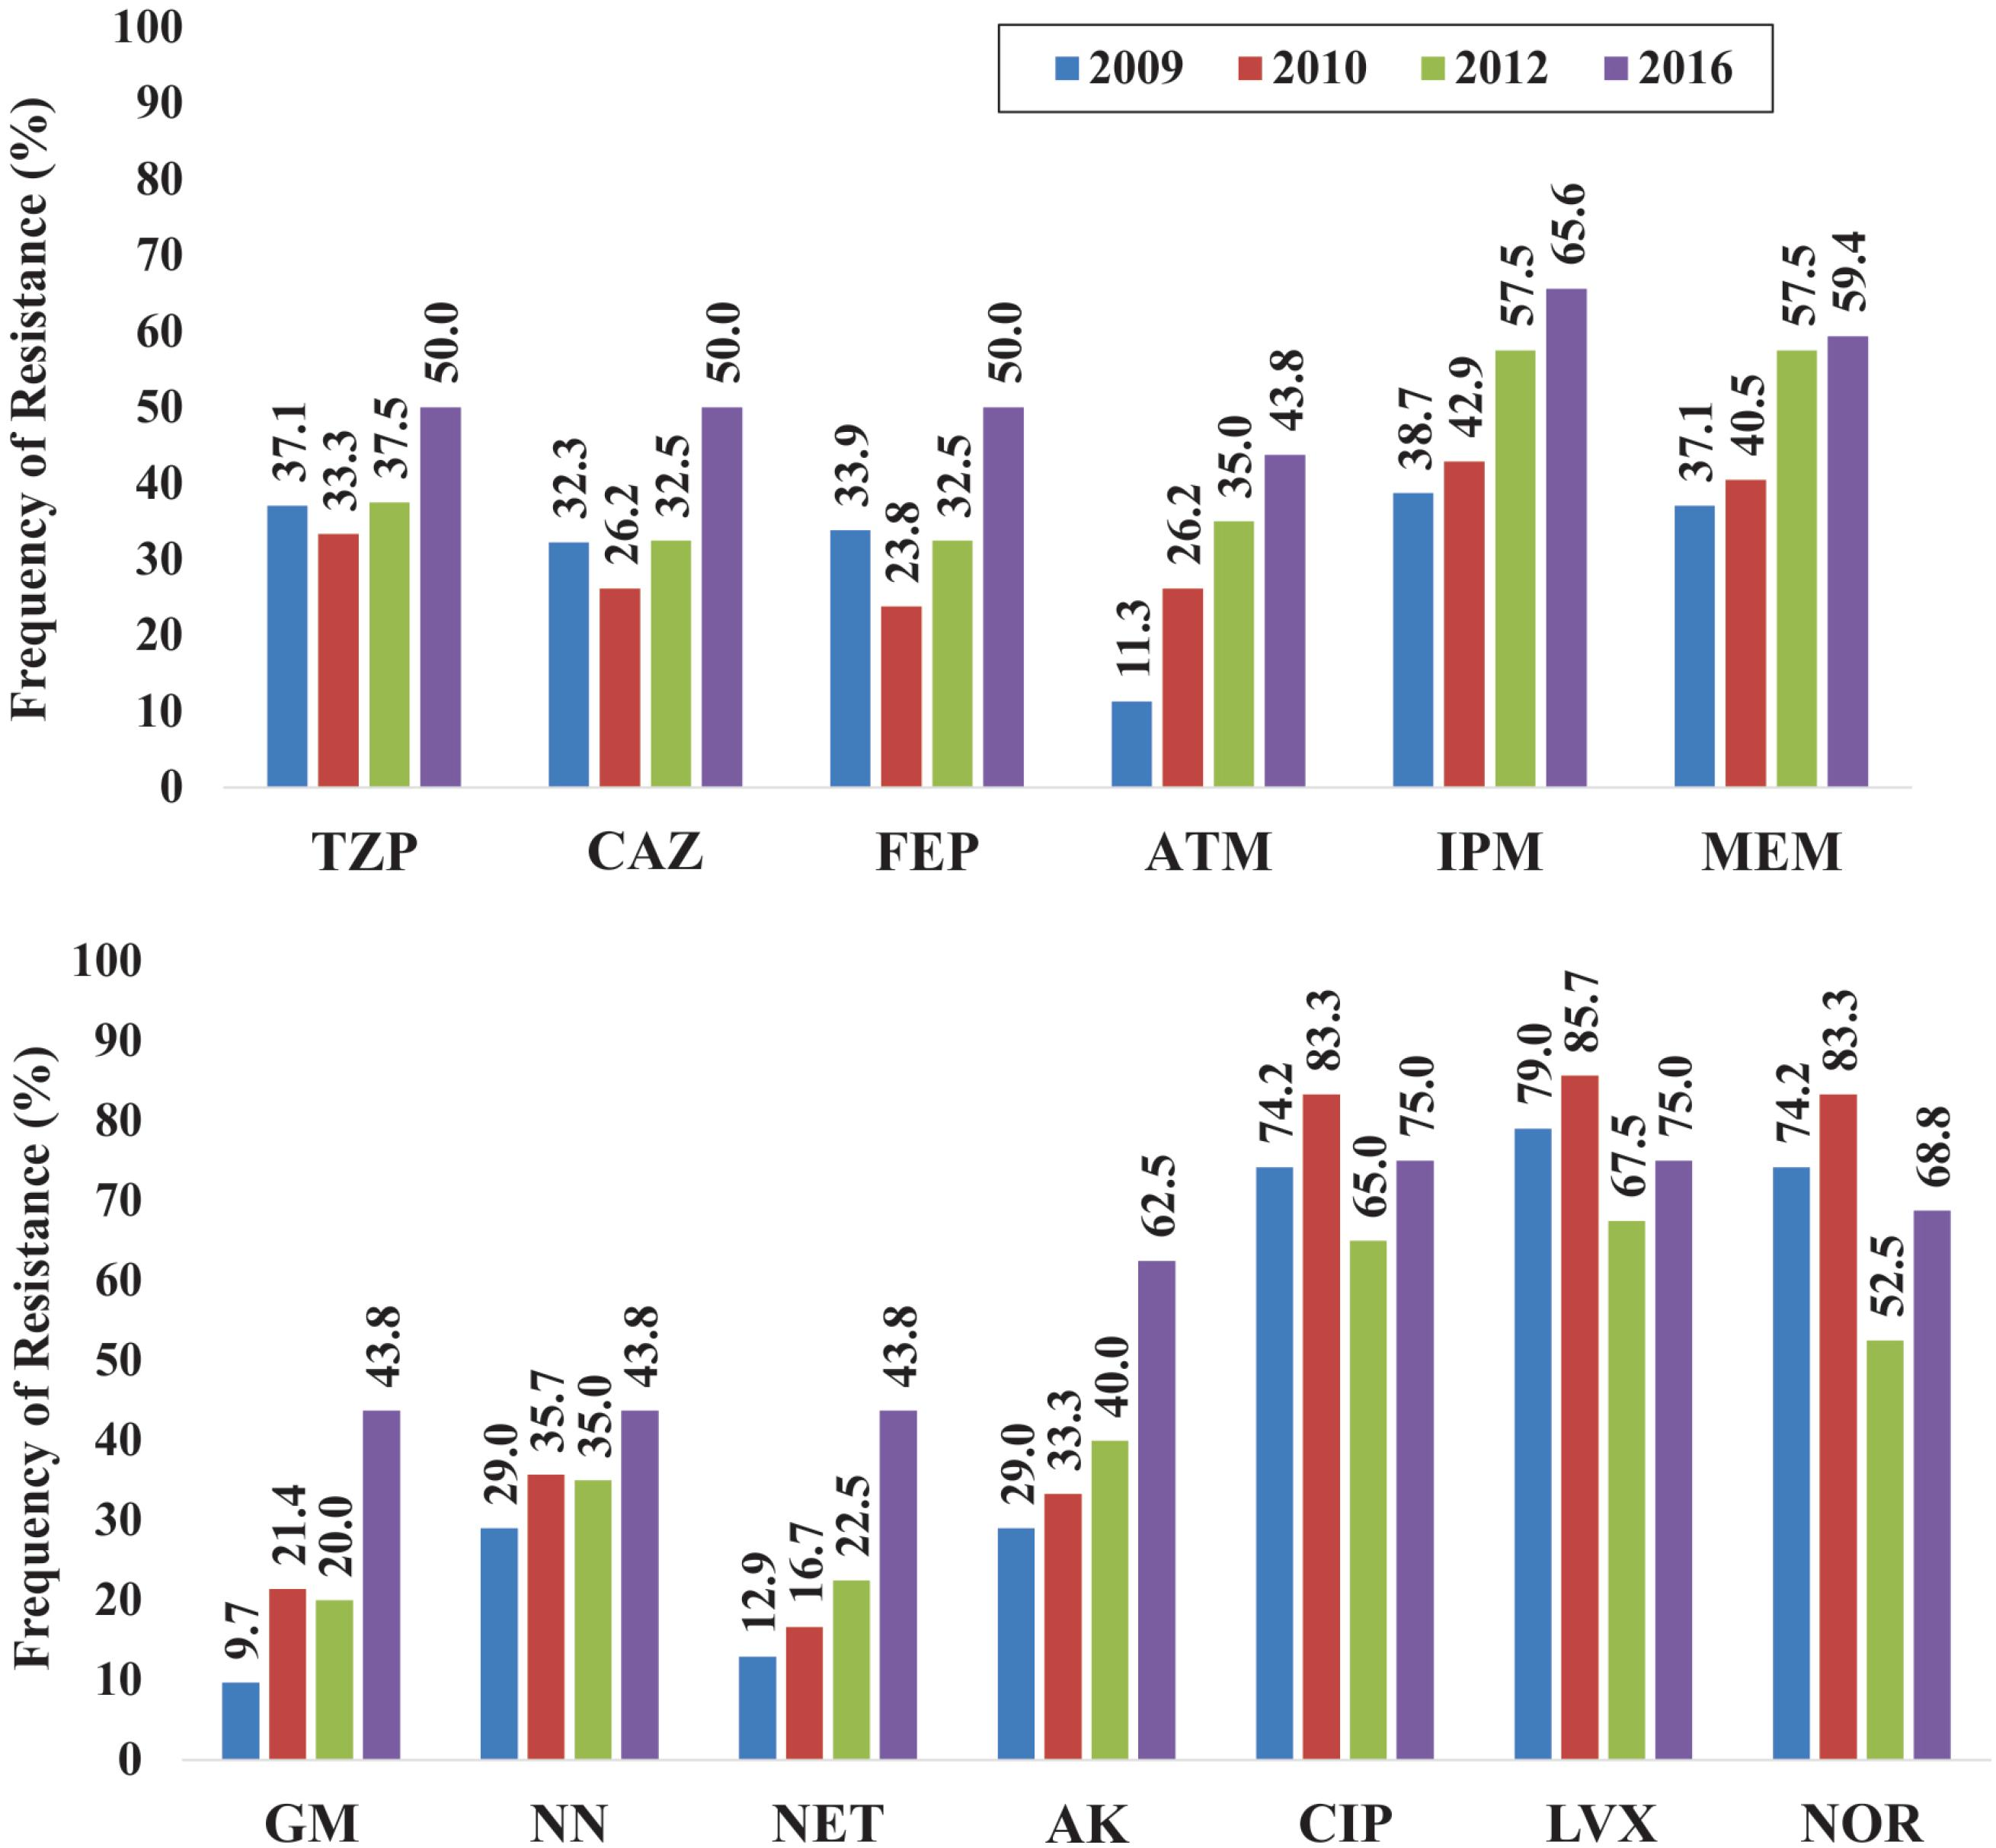 Frequency of P. aeruginosa strains resistant to betalactamics (top) as well as aminoglycosides and quinolones (bottom). TZP: piperacillin/tazobactam, CAZ: ceftazidime, FEP: cefepime, ATM: aztreonam, IPM: imipenem, MEM: meropenem, GM: gentamicin, NN: tobramycin, NET: netilmicin, AK: amikacin, CIP: ciprofloxacin, LVX: levofloxacin; NOR: norfloxacin.